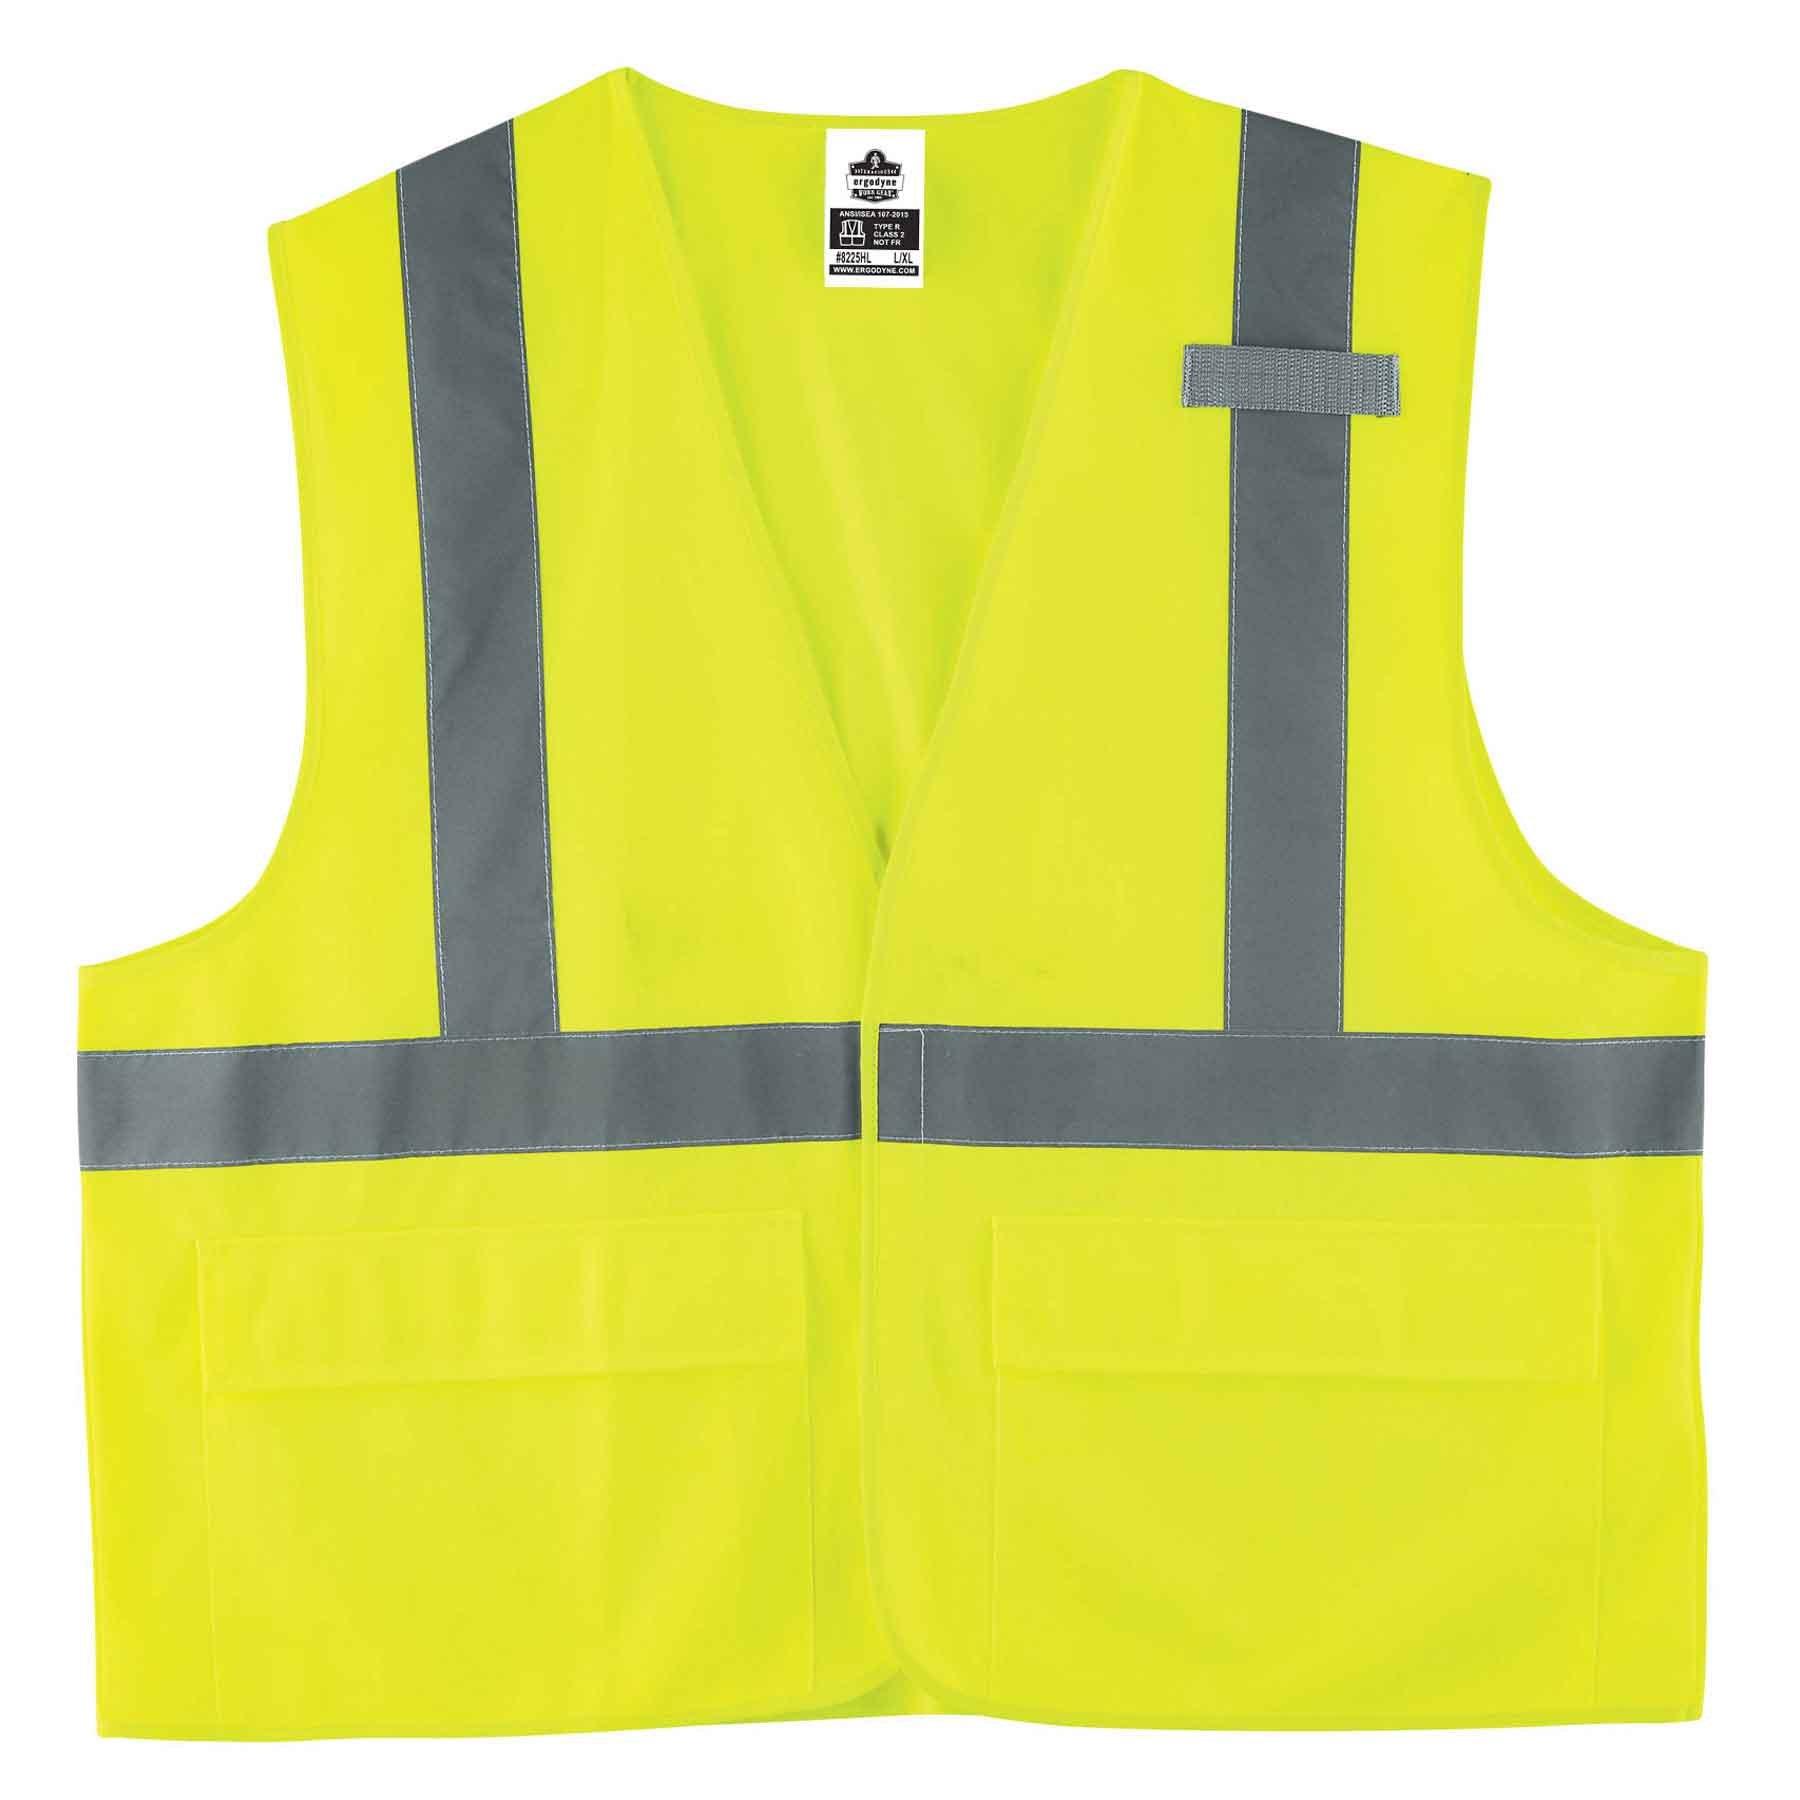 Ergodyne GloWear 8225HL ANSI High Visibility Lime Solid Reflective Safety Vest, Hook & Loop Closure, Large/X-Large